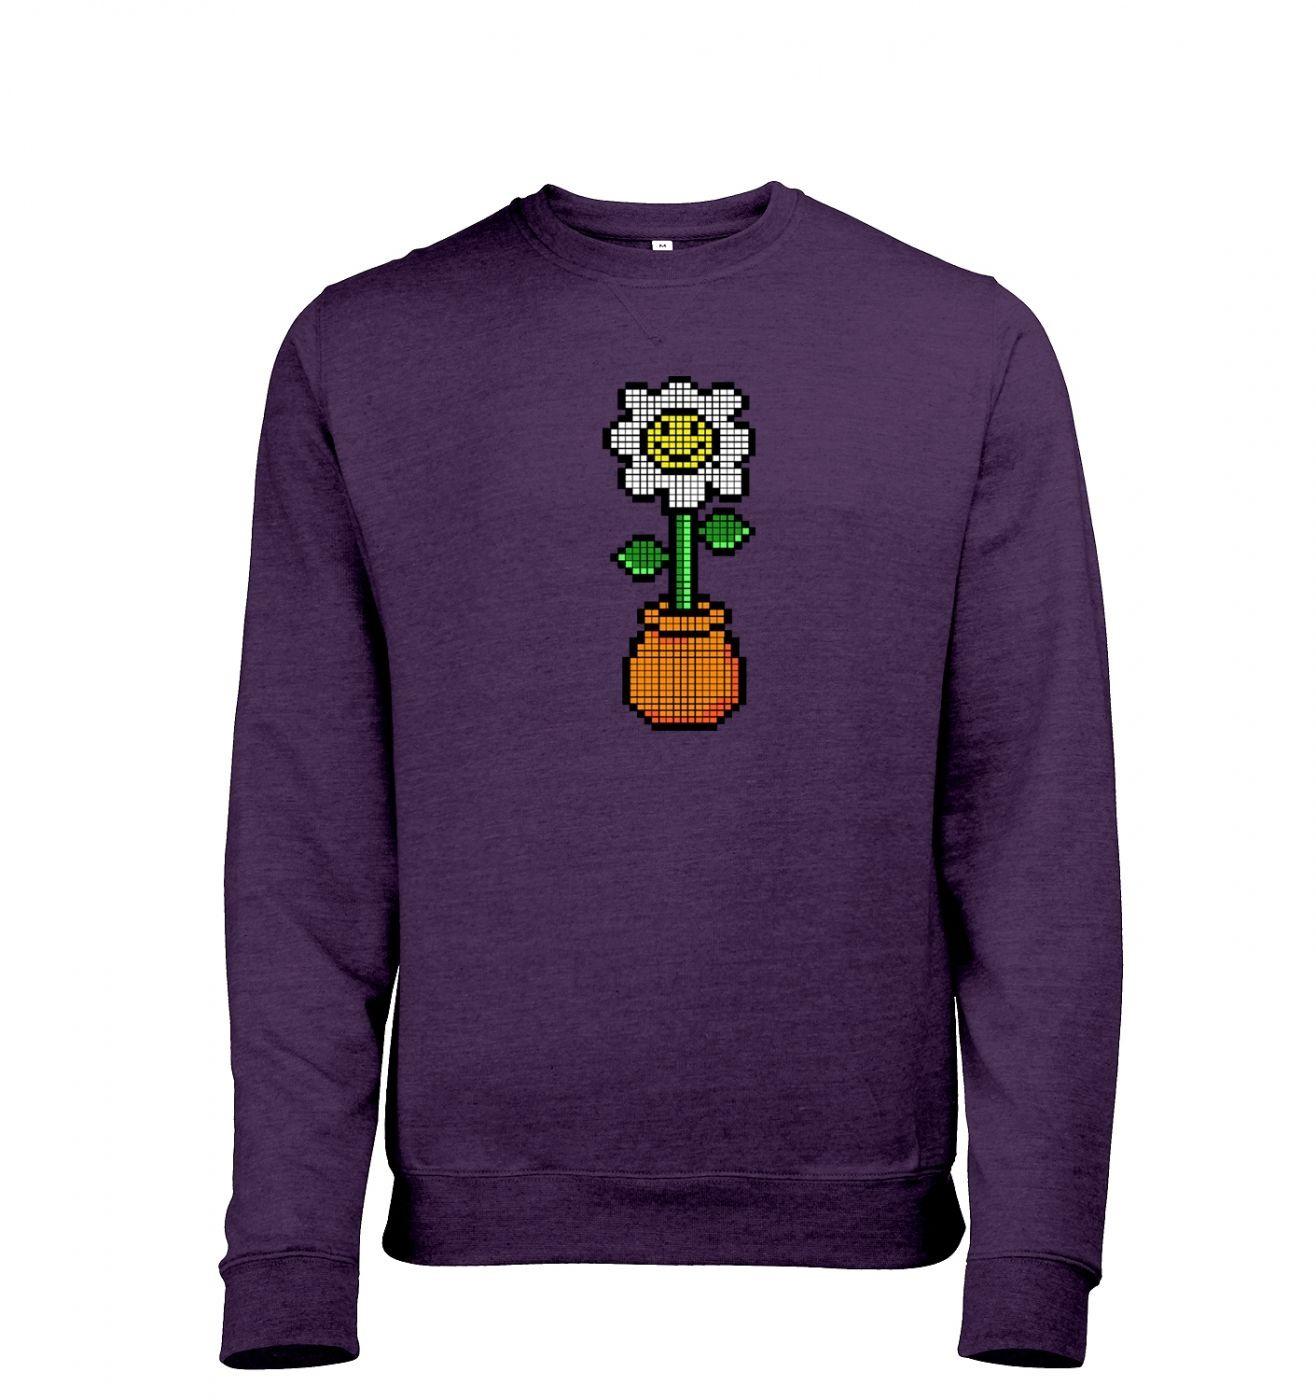 8-Bit Daisy men's heather sweatshirt